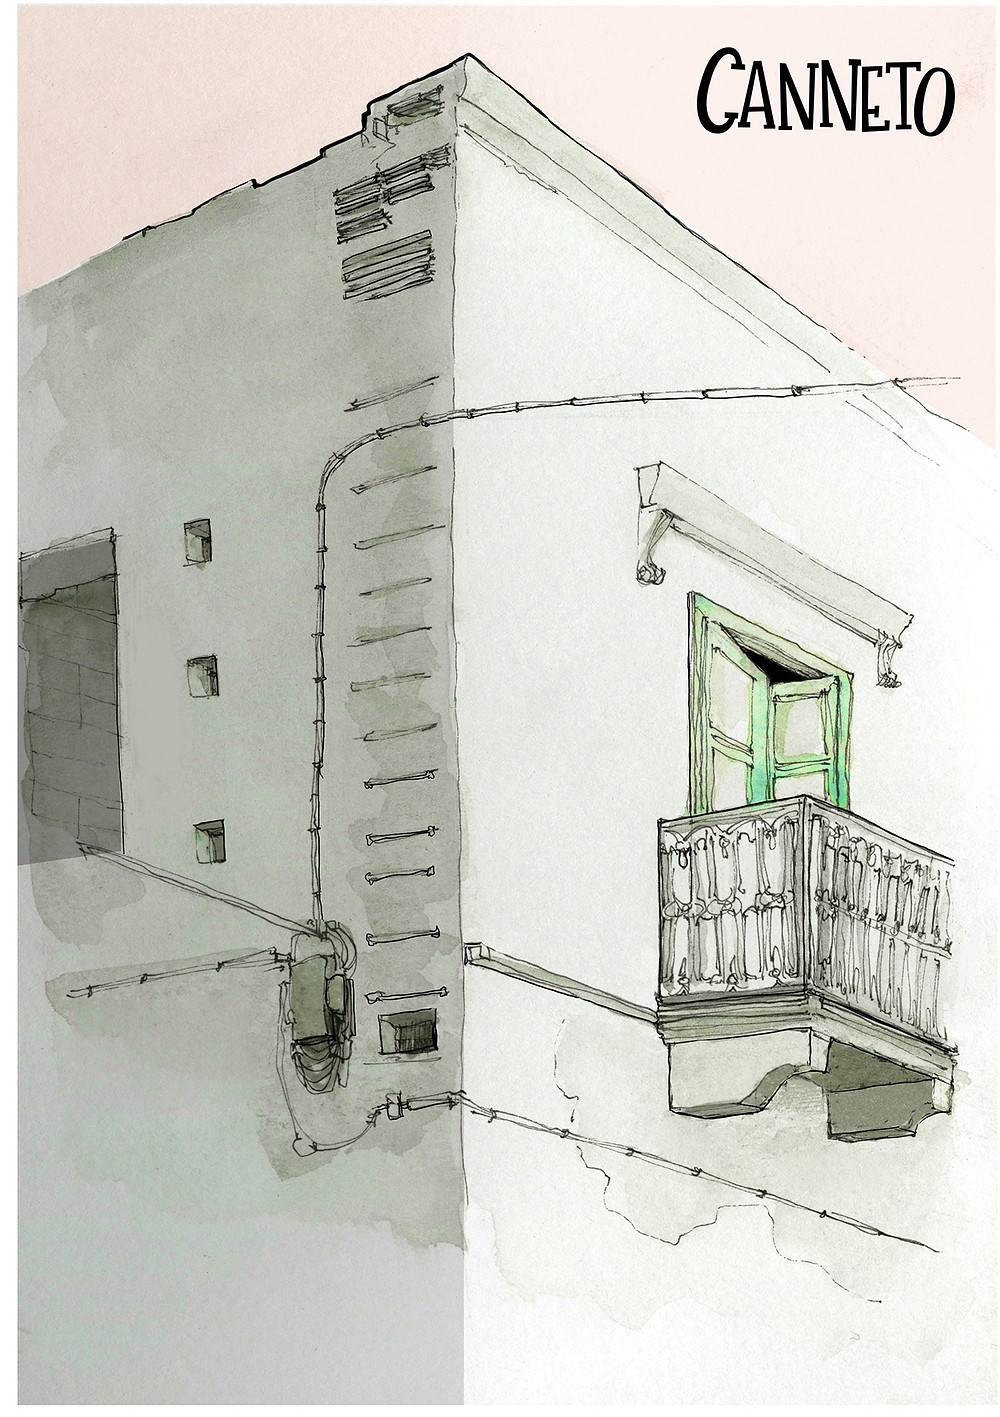 Lipari Canneto Aeolian Islands Blog Marcellooo Sicily Italy Drawing Skecth Jdan